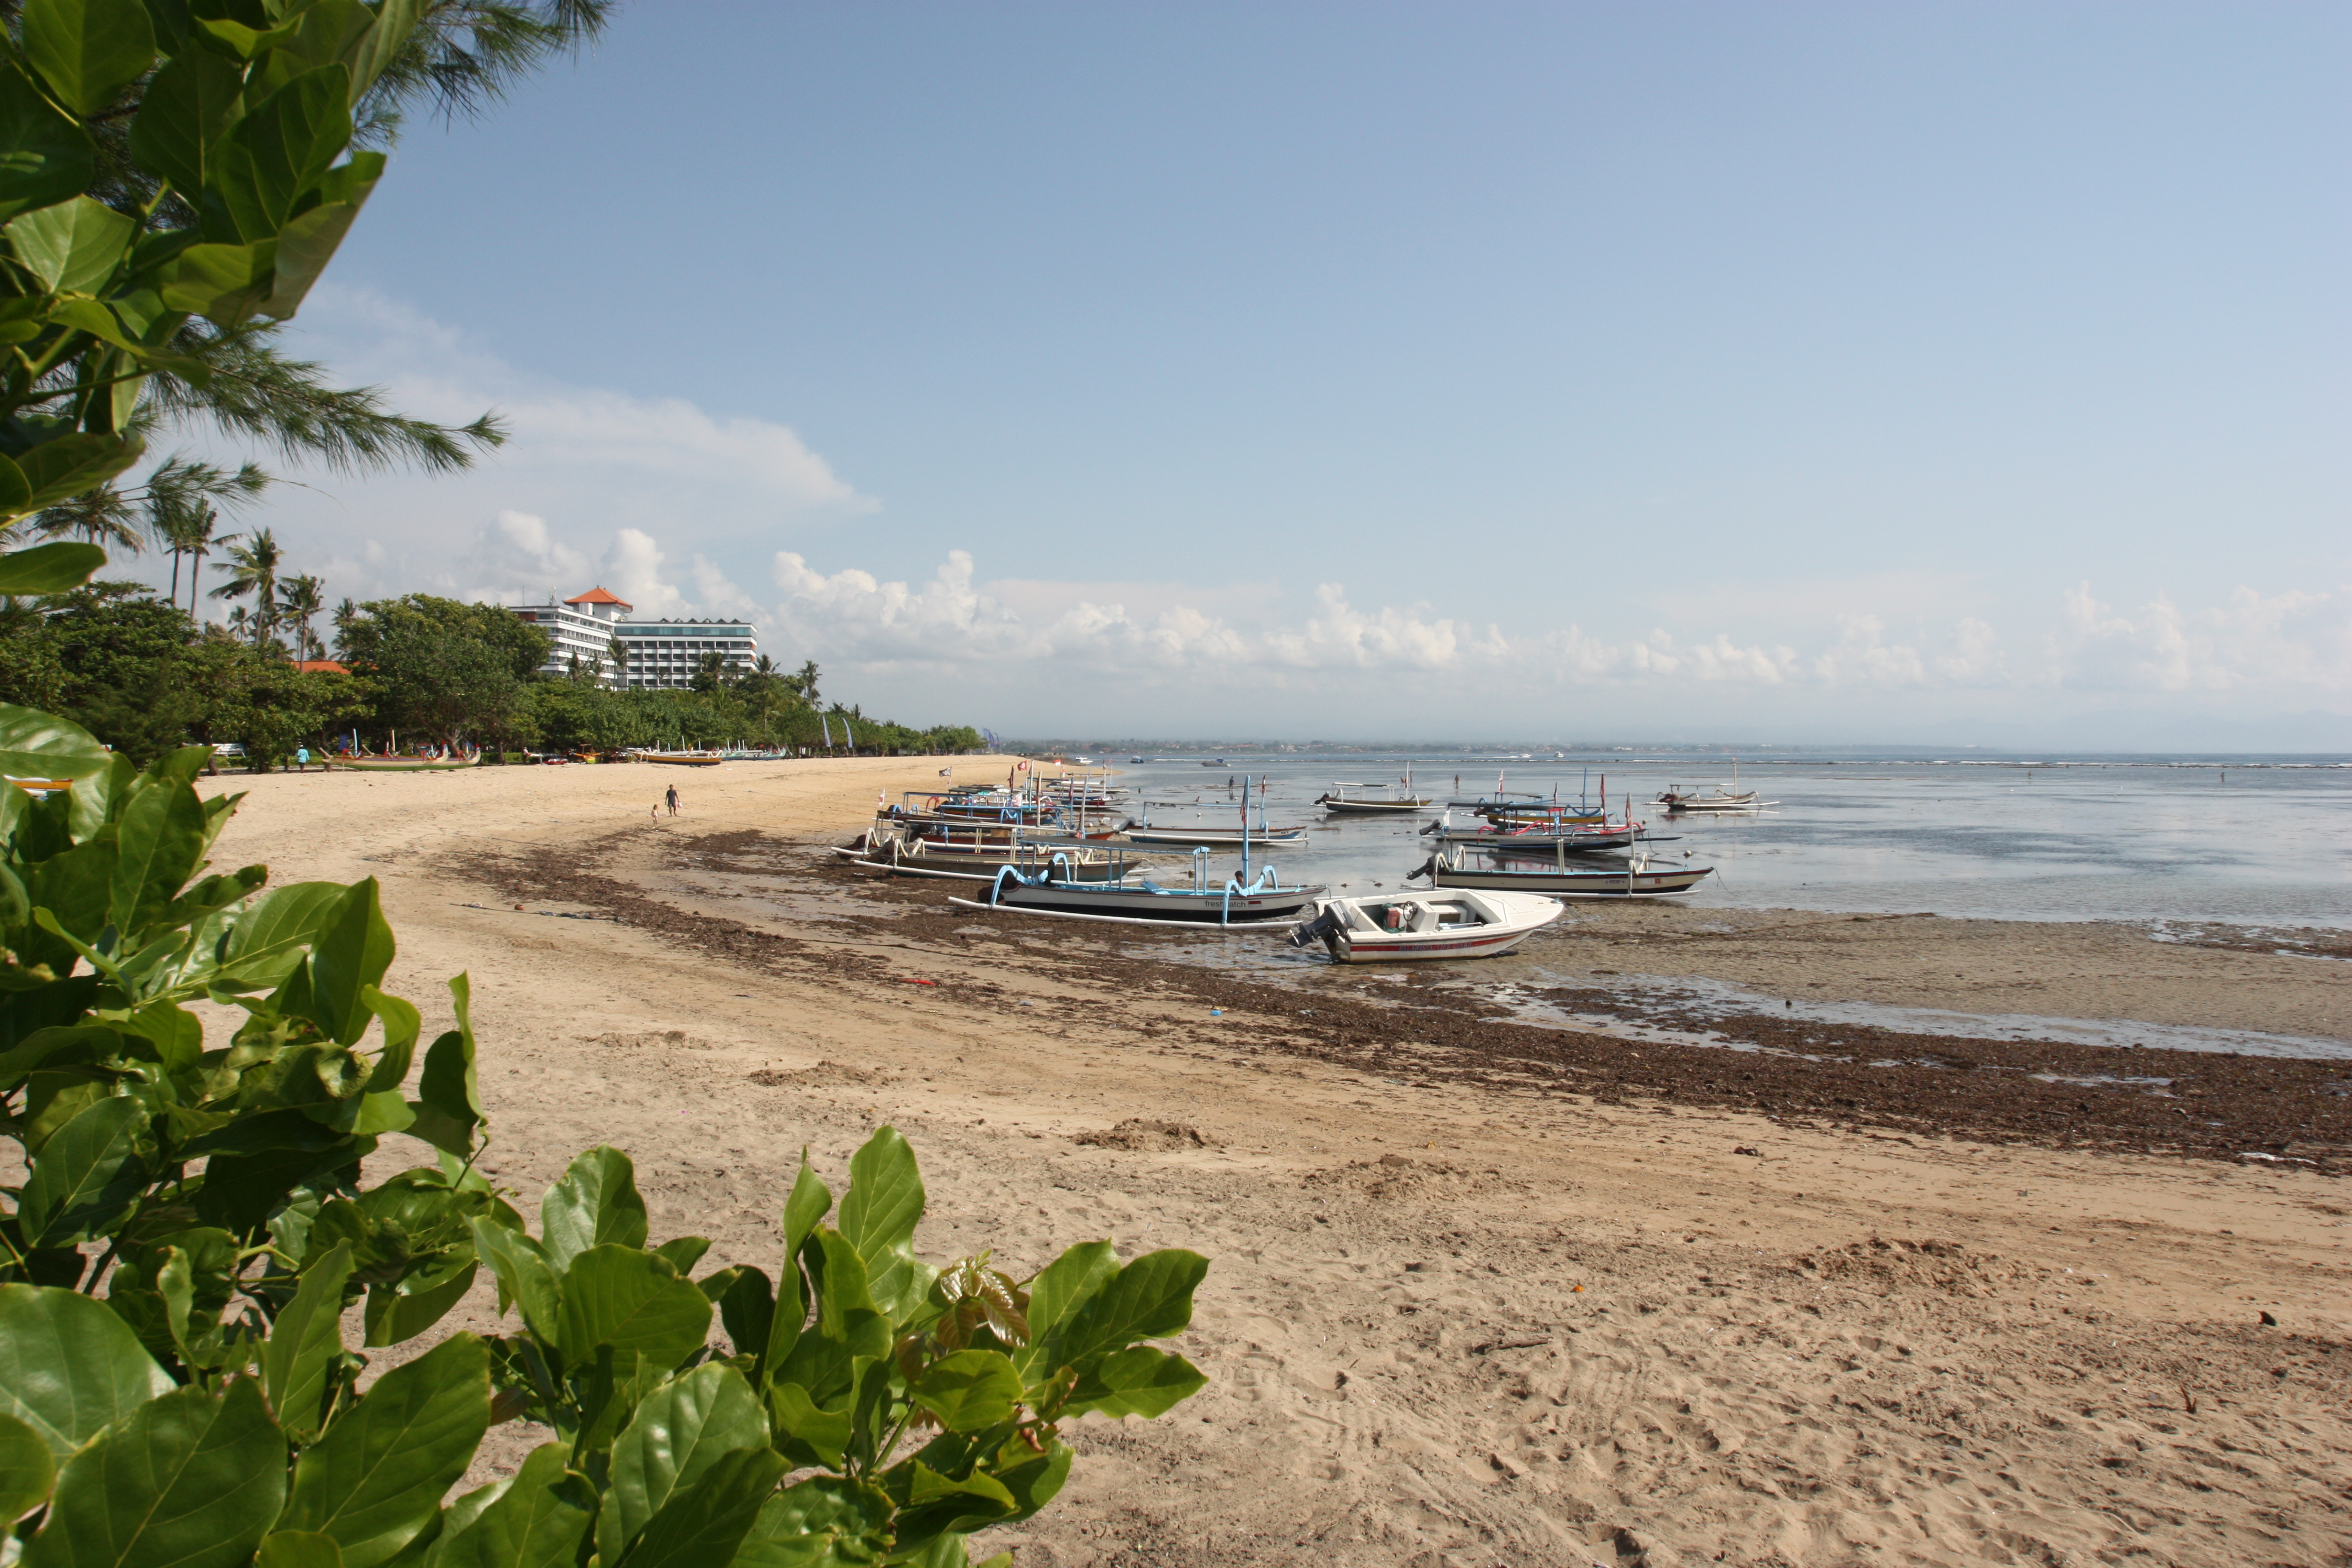 Bali Bali Beach Resort Davao